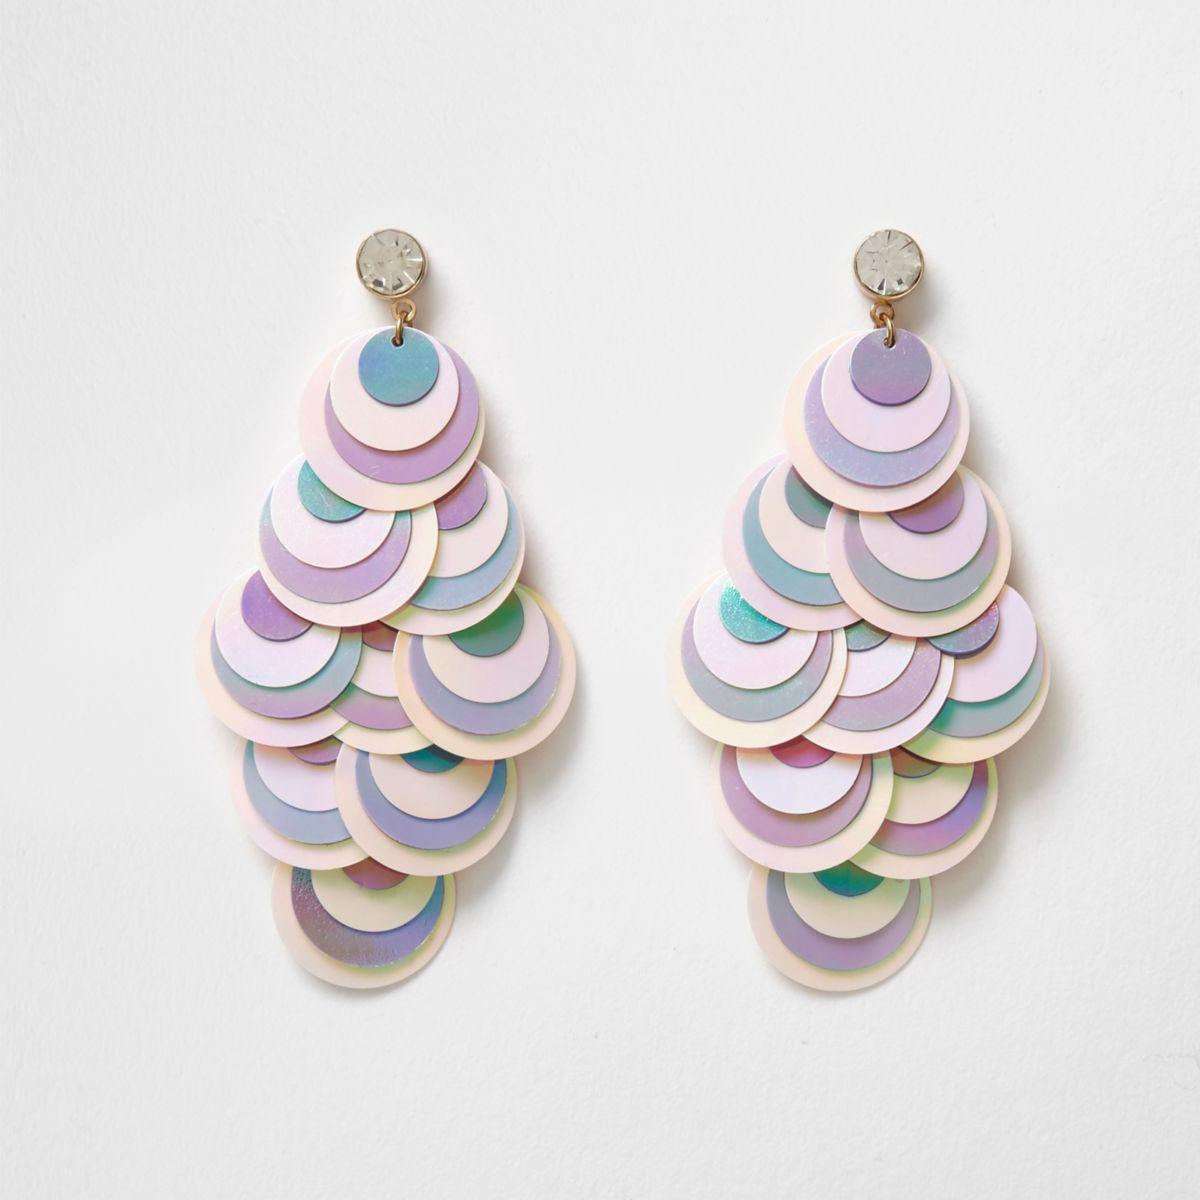 White iridescent sequin drop earrings